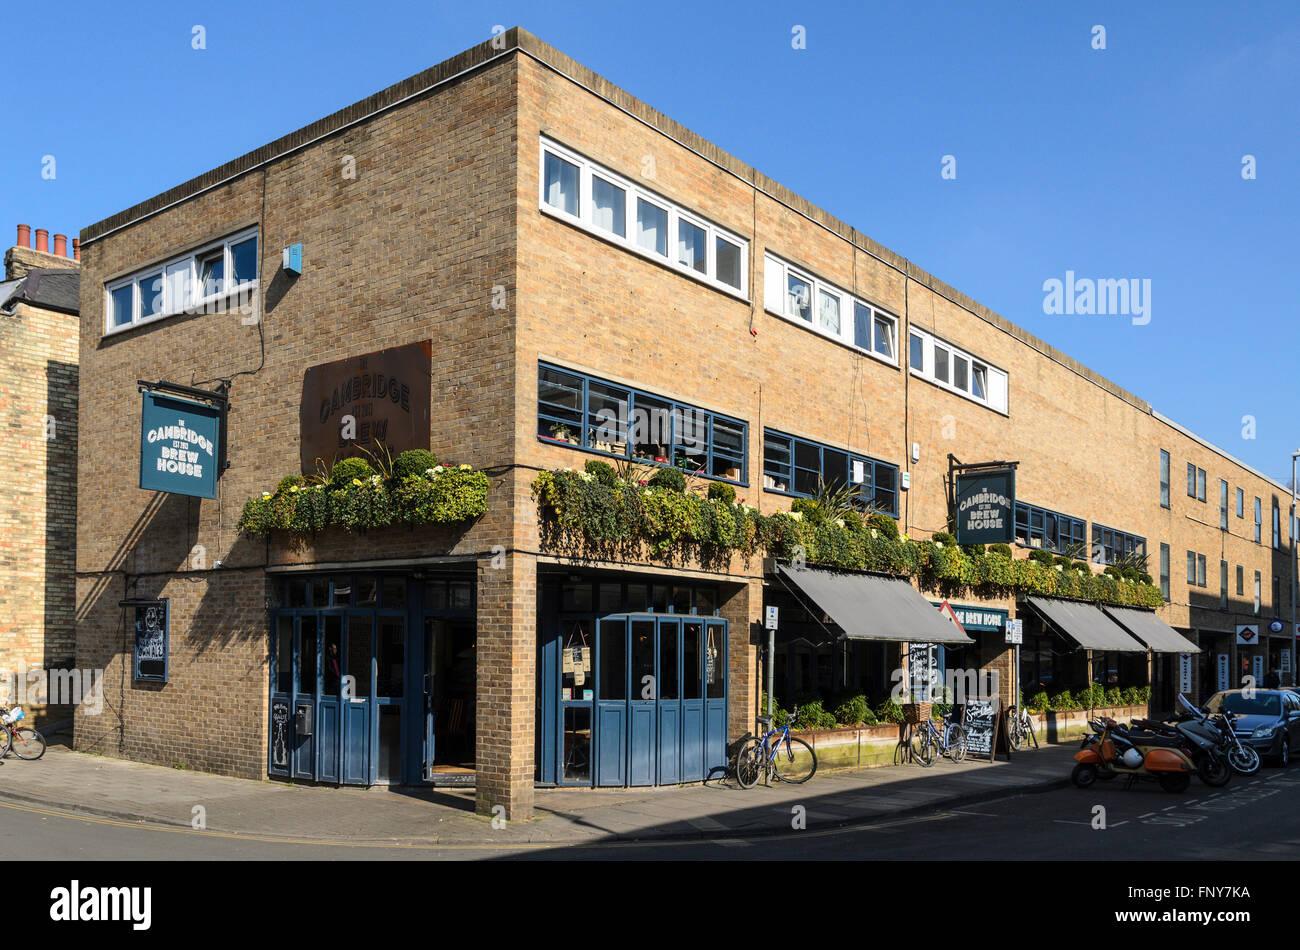 The Cambridge Brew House, Cambridge, England, UK. Stock Photo